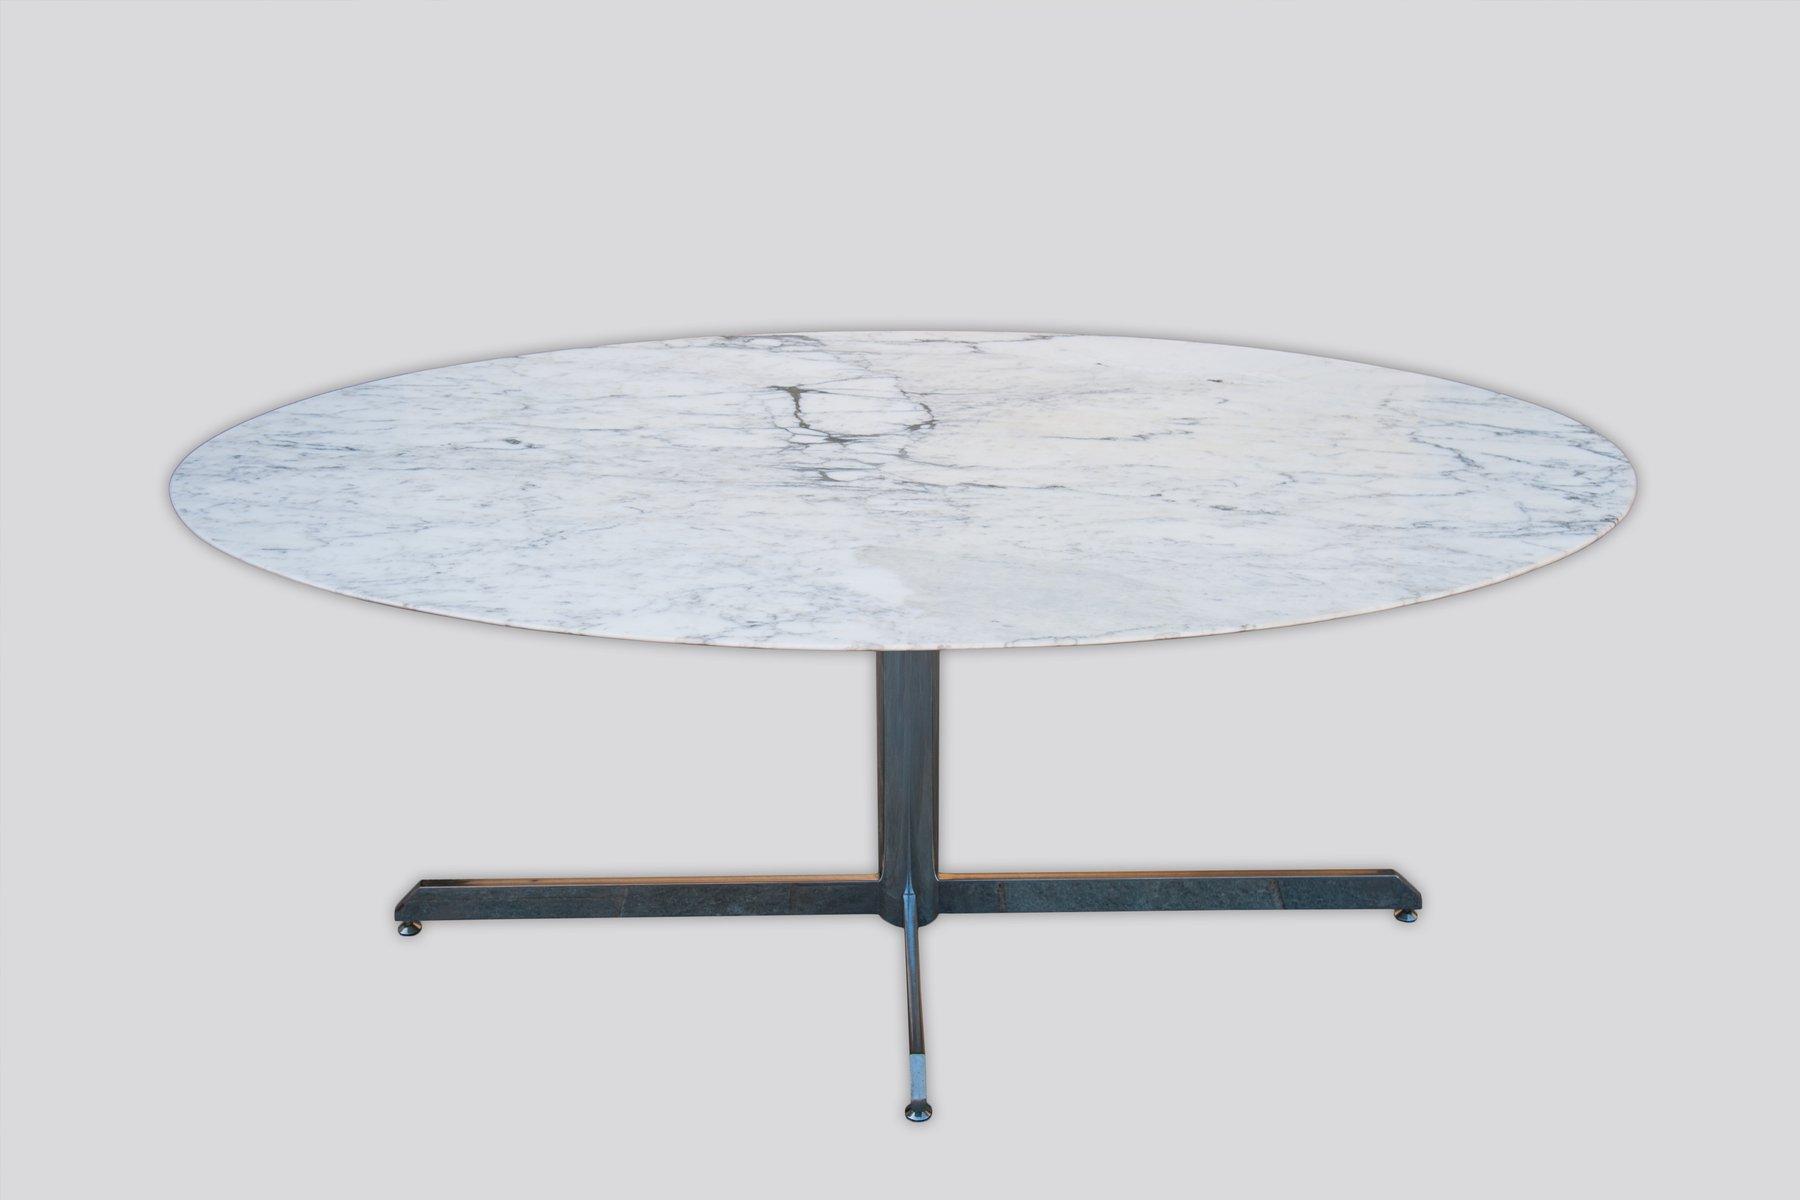 Ovaler Vintage Tisch aus verchromtem Metall & Marmor, 1950er